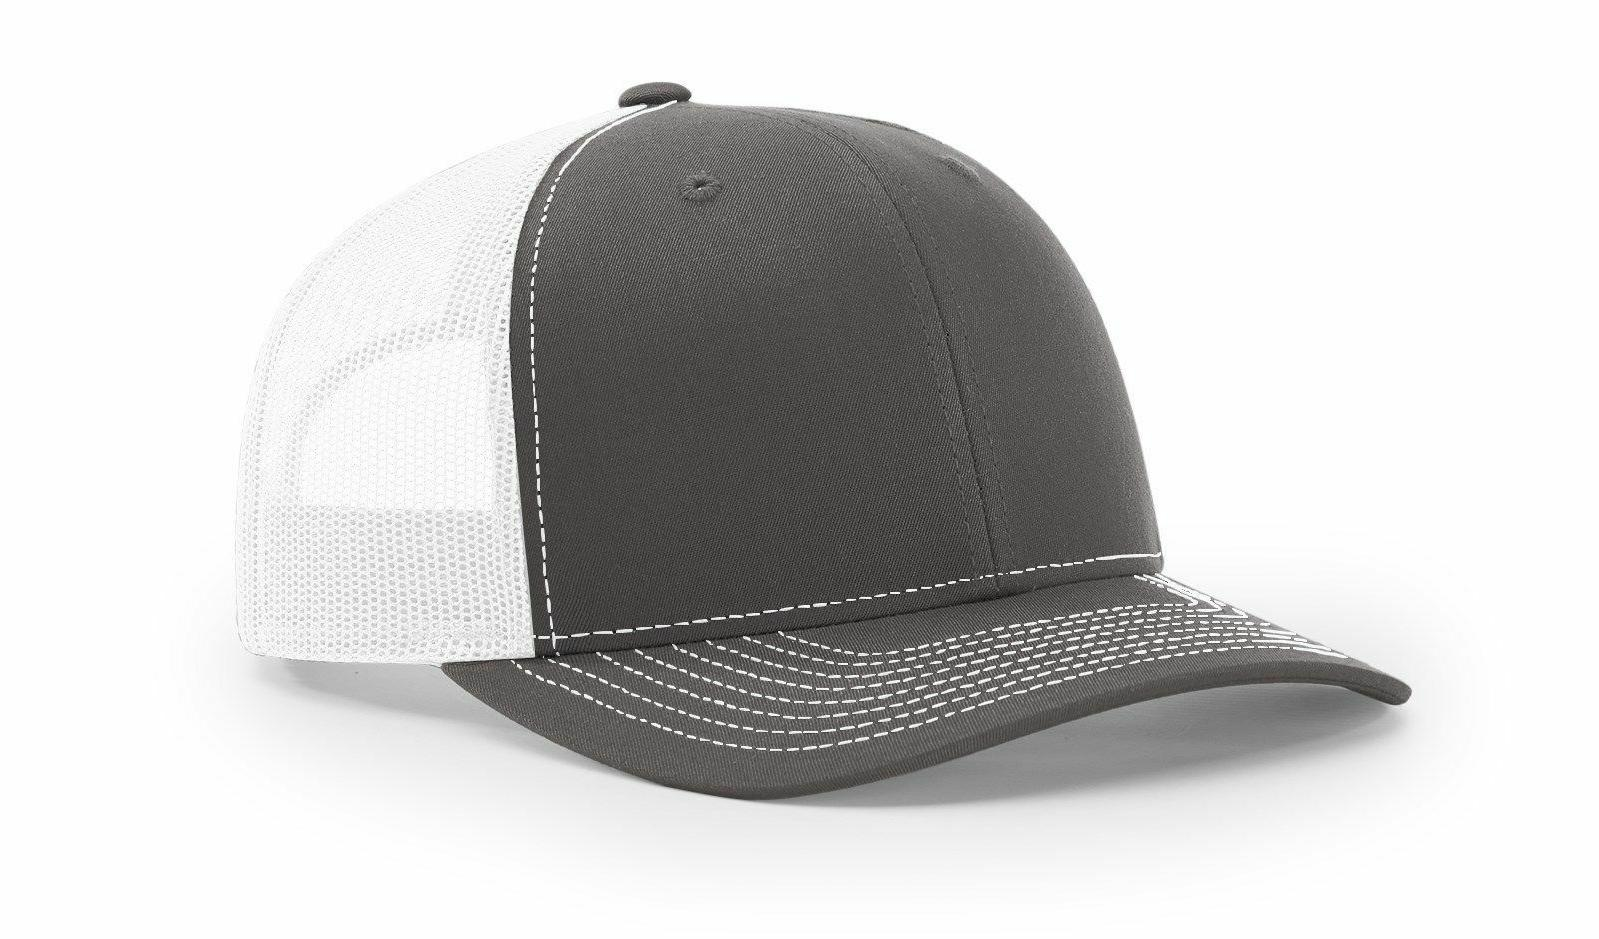 8f645504d7c60 CHARCOAL WHITE 112 Richardson Trucker Ball Cap Mesh Hat Adju